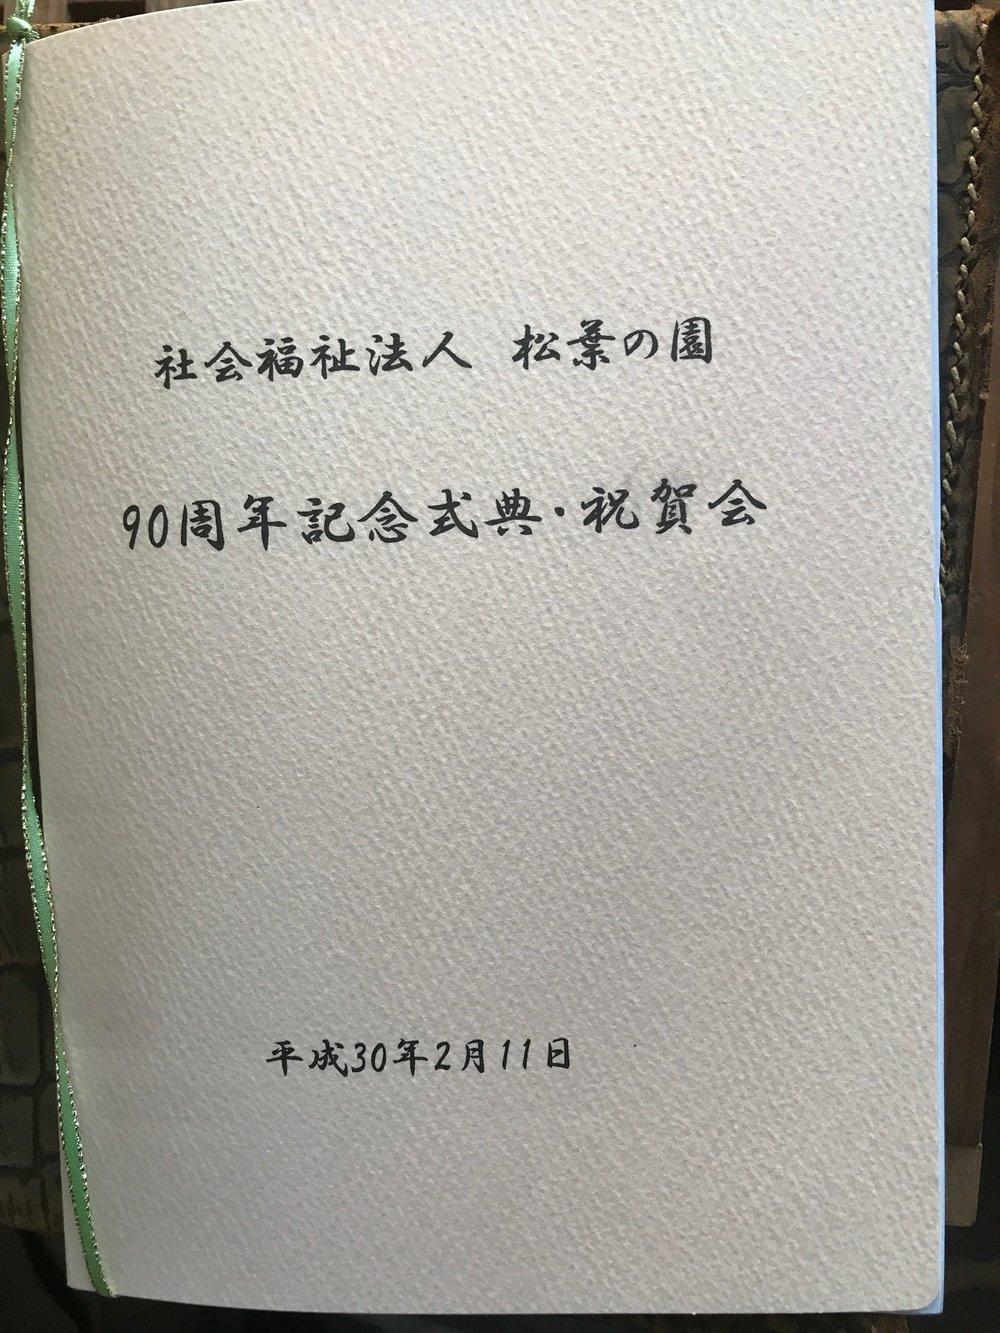 IMG_7010.JPG